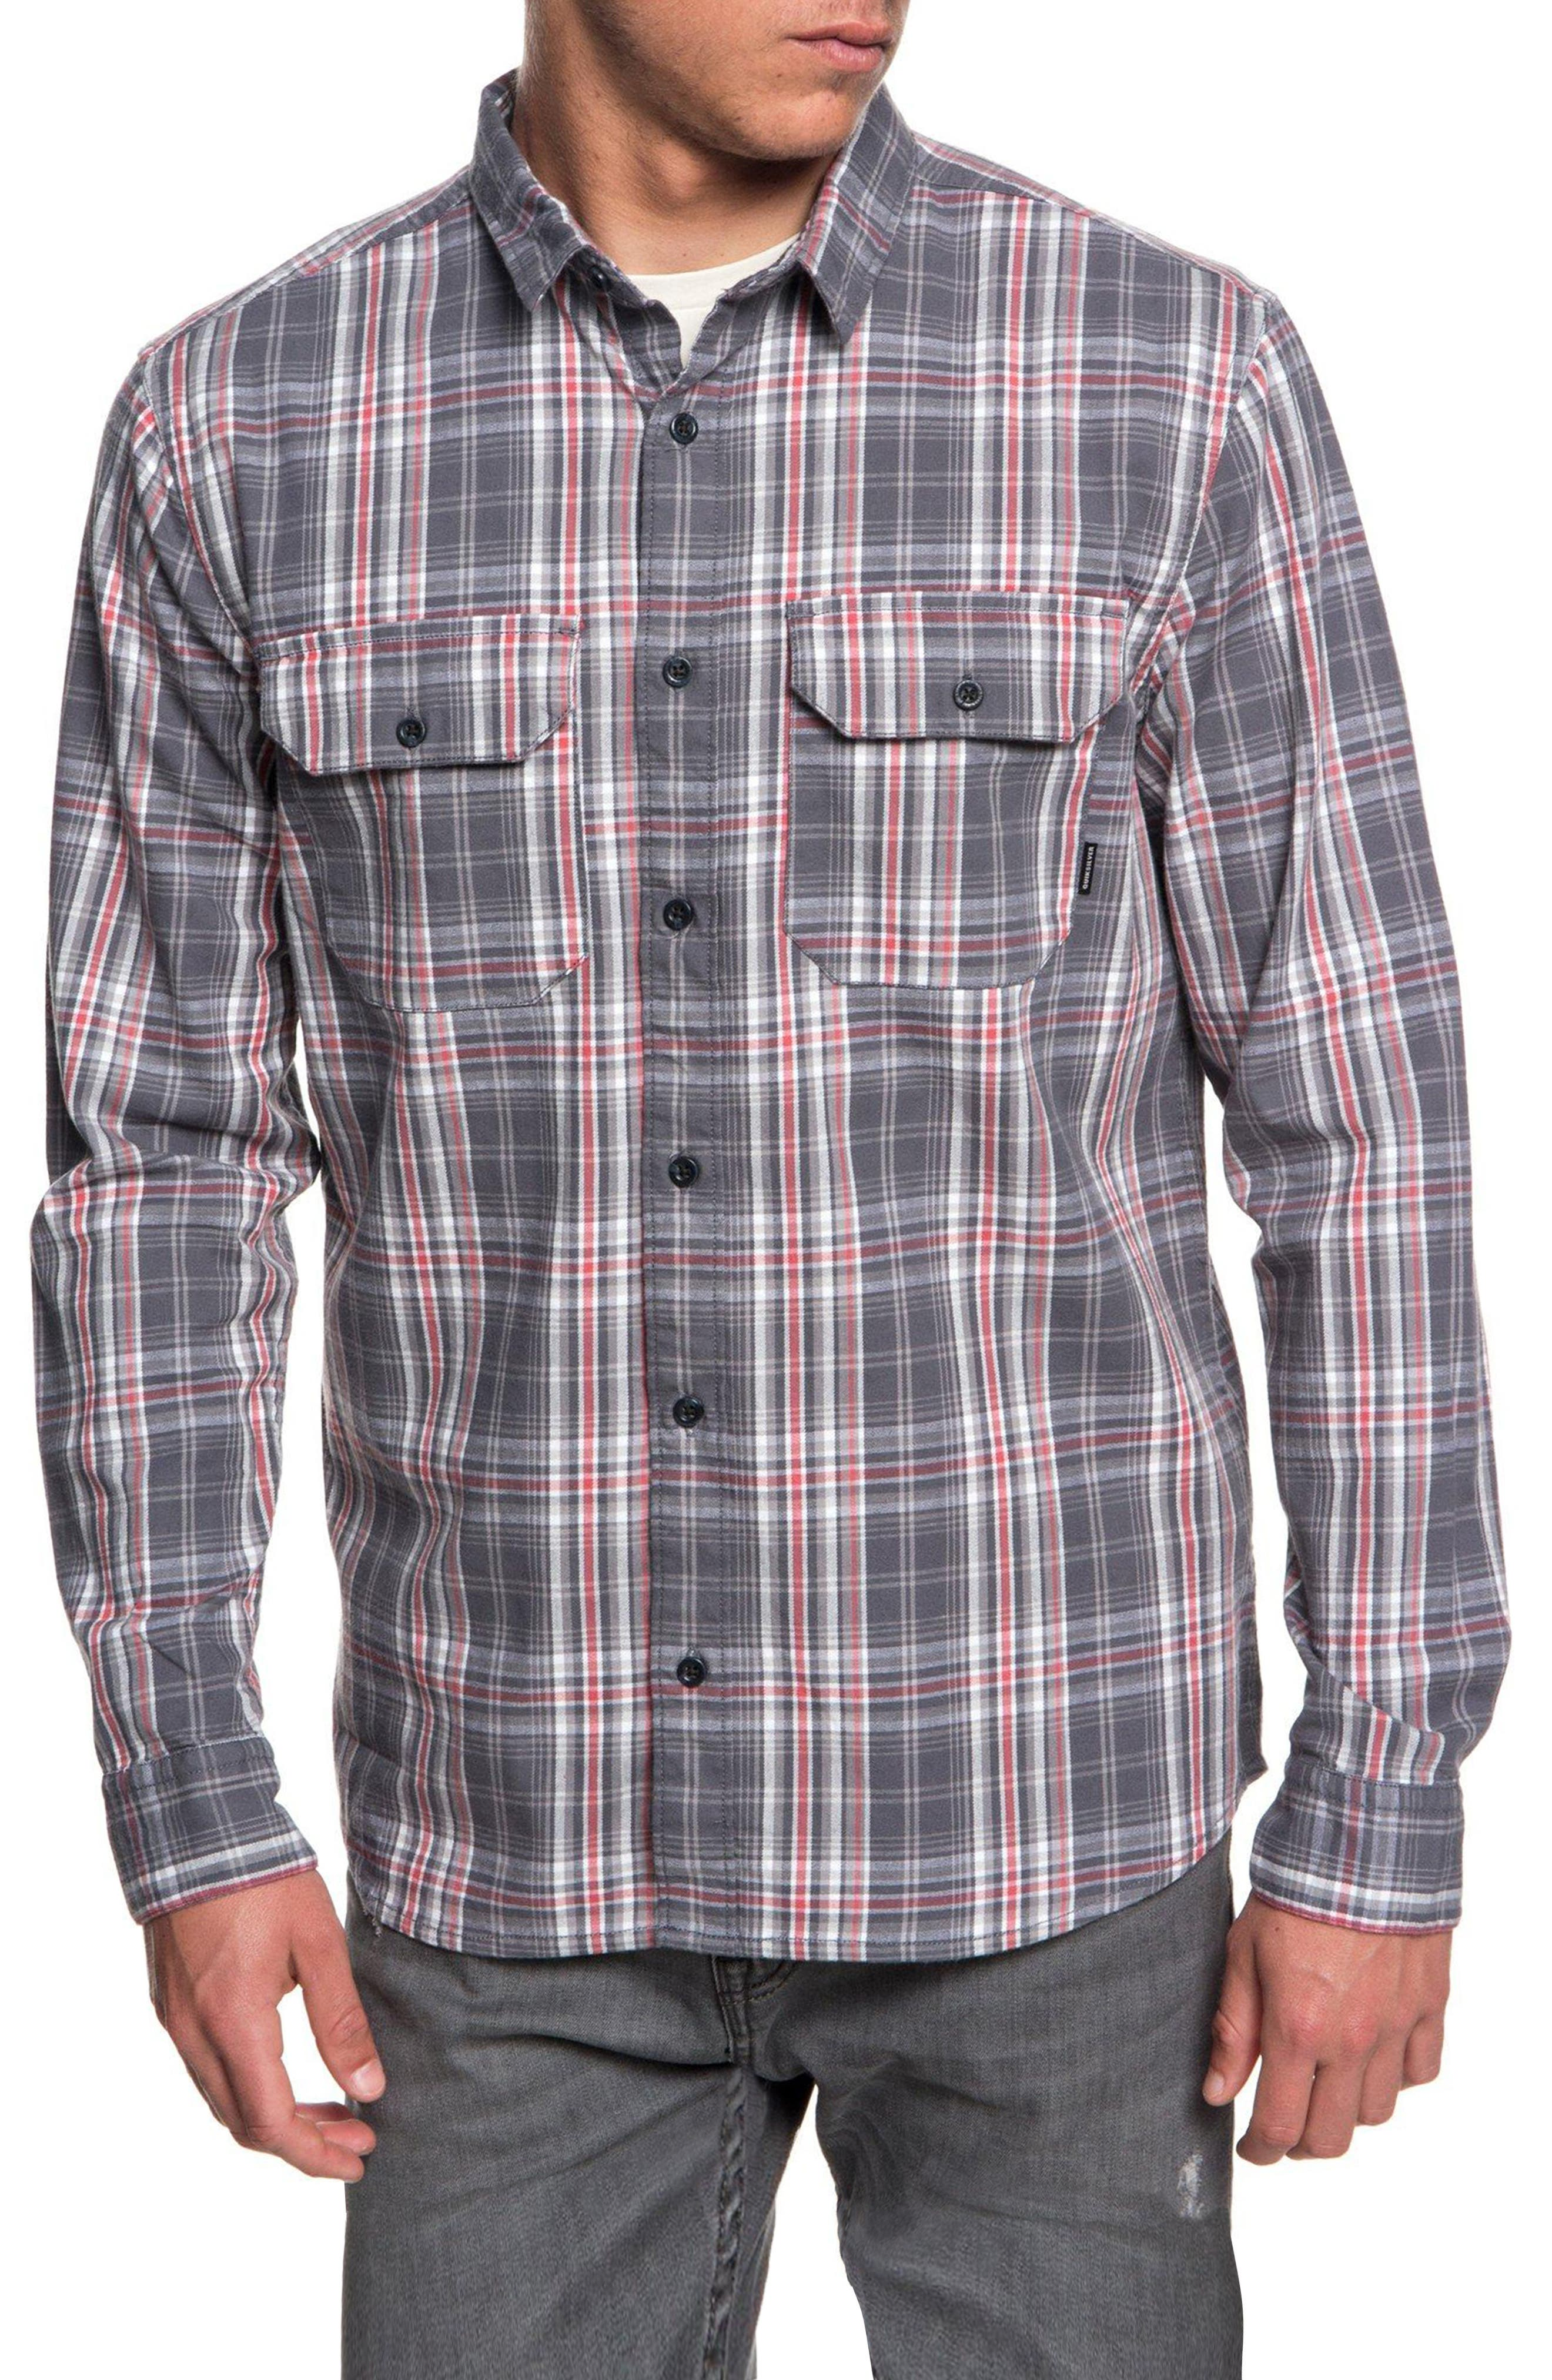 Fitz Sport Shirt,                             Main thumbnail 1, color,                             IRON GATE FITZ CHECK